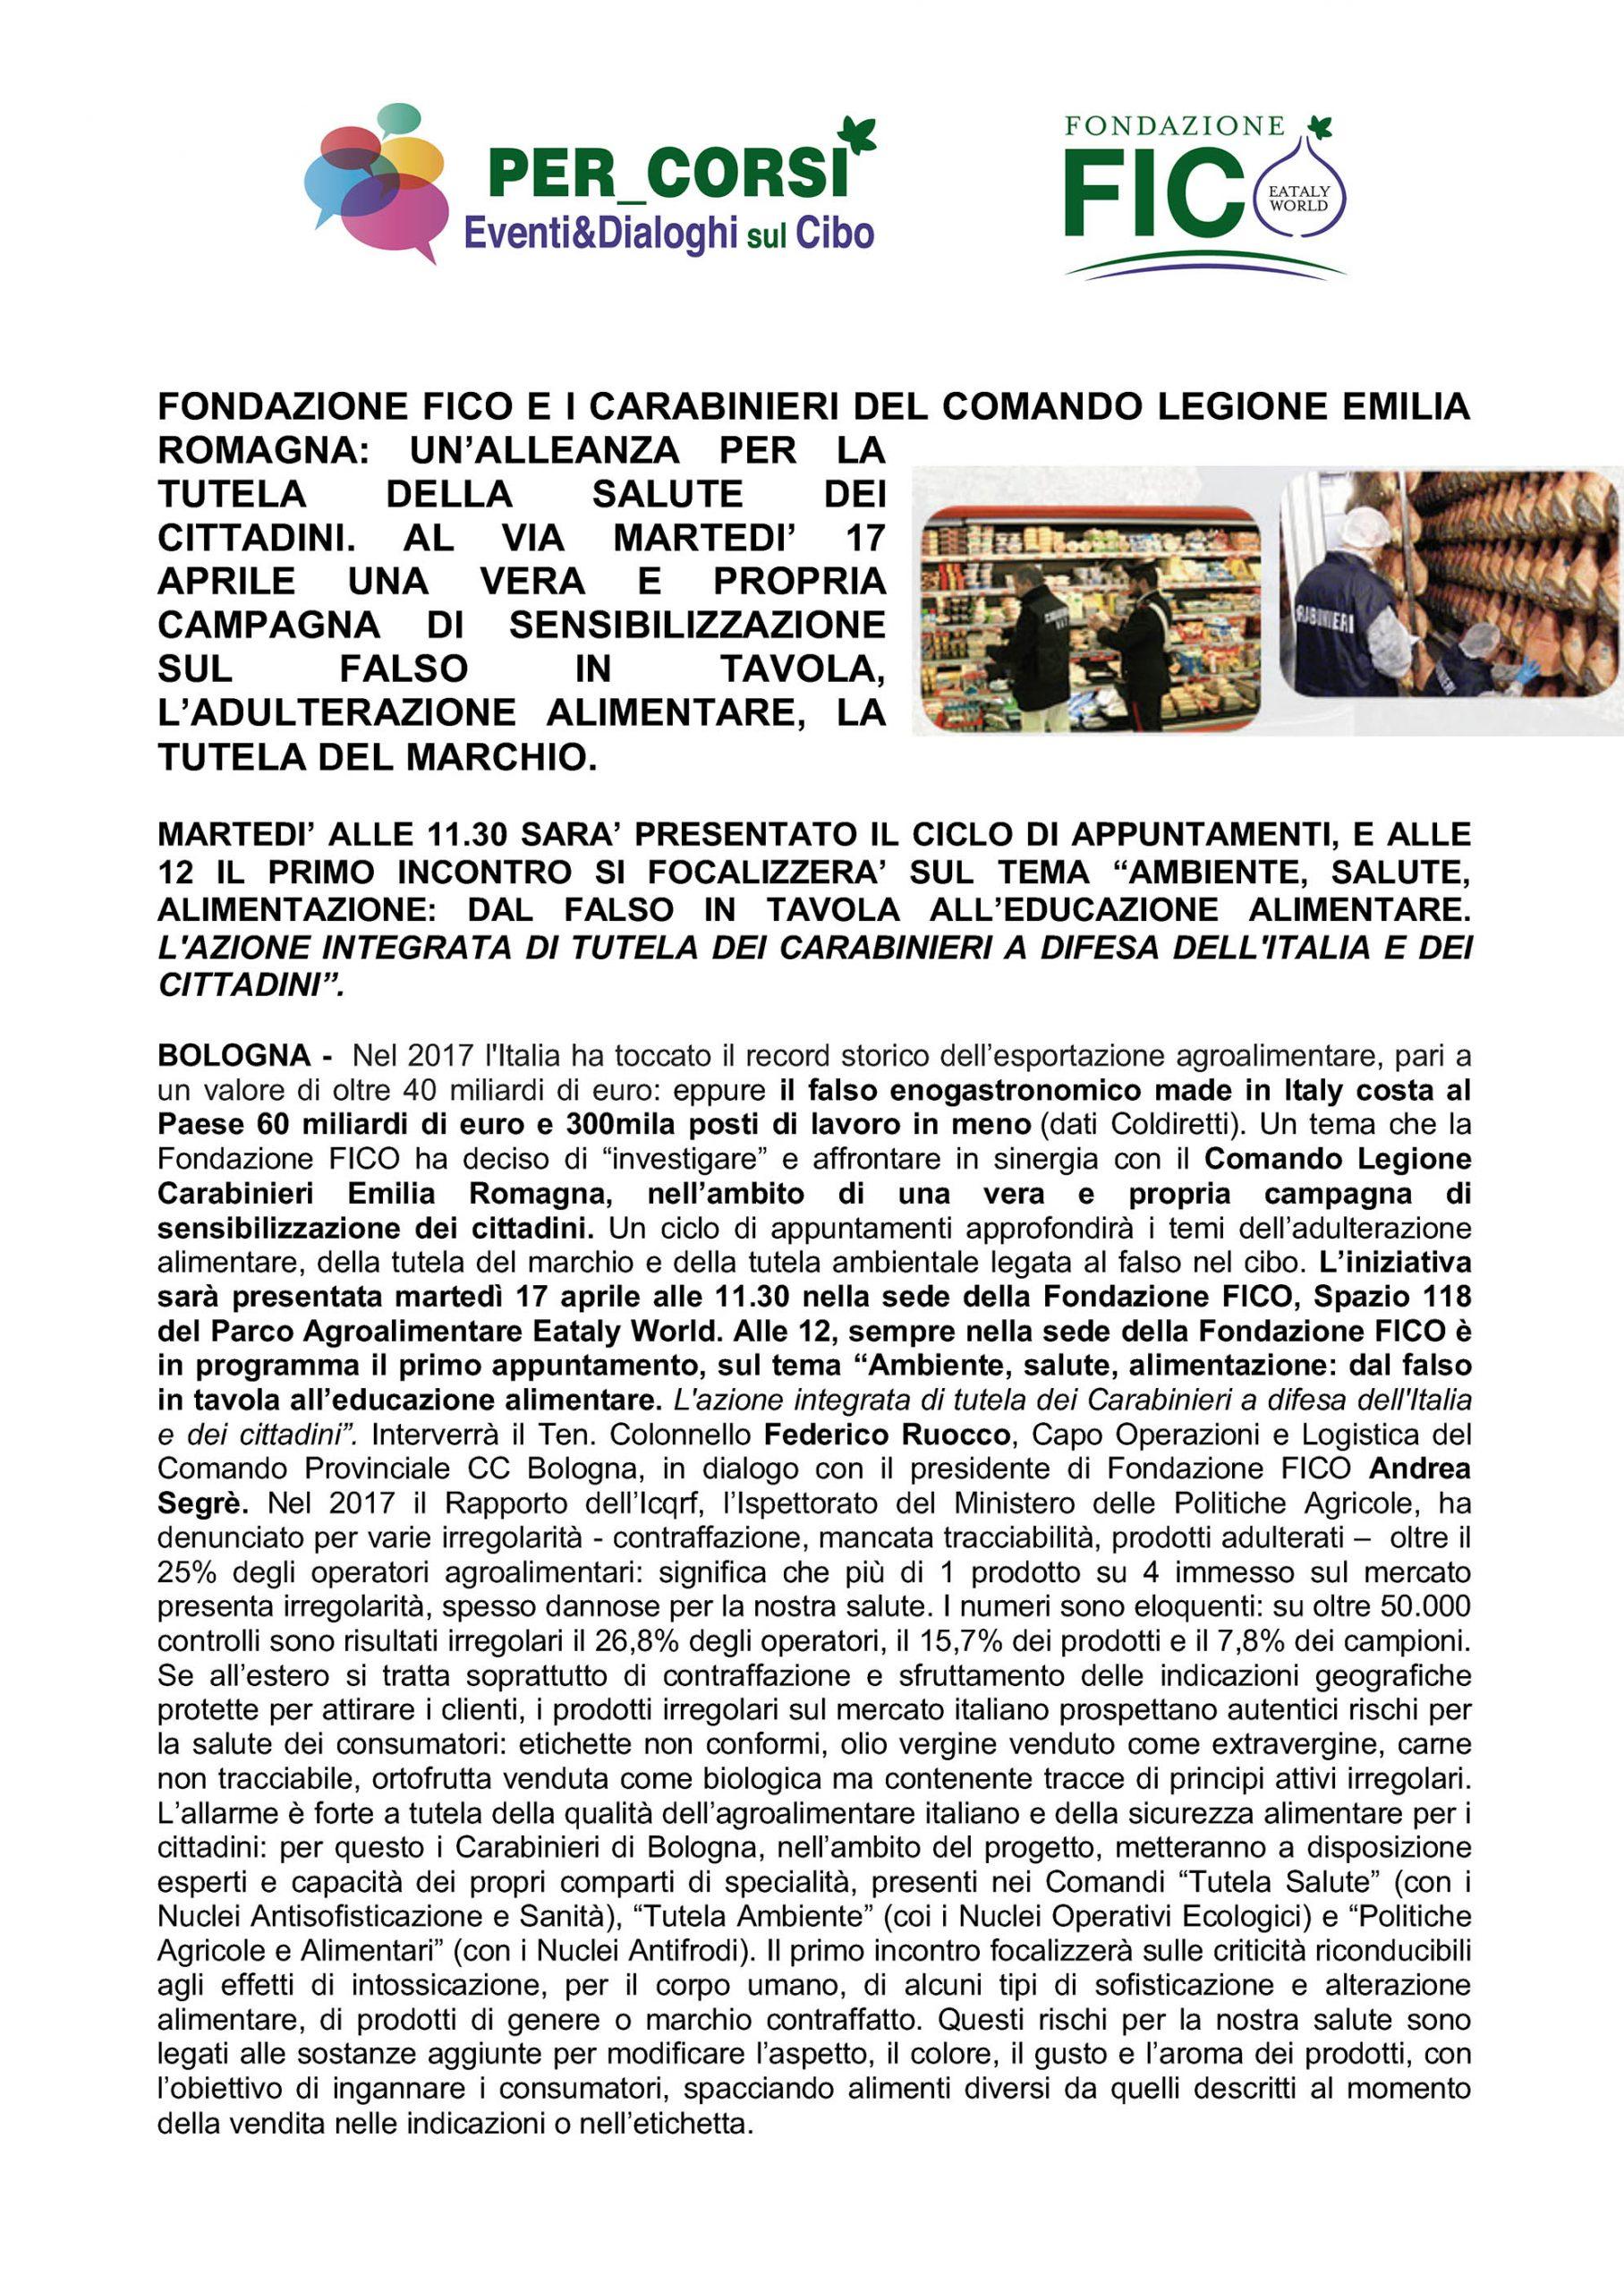 CS-0050-17-04-2018-INCONTRI-CARABINIERI